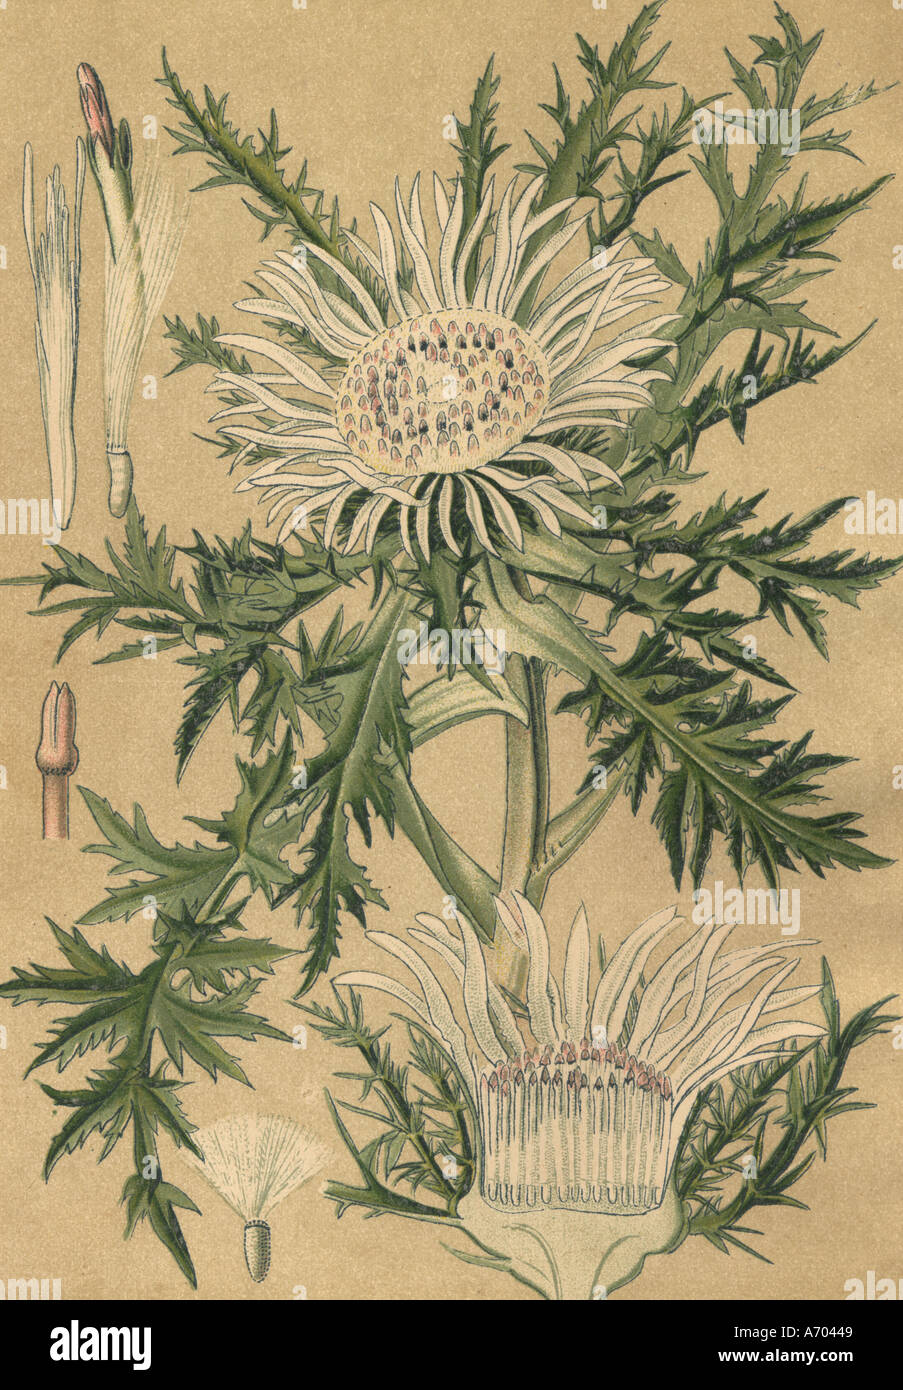 Medicinal plant Carlina acaulis Eberwurz historical 1895 - Stock Image